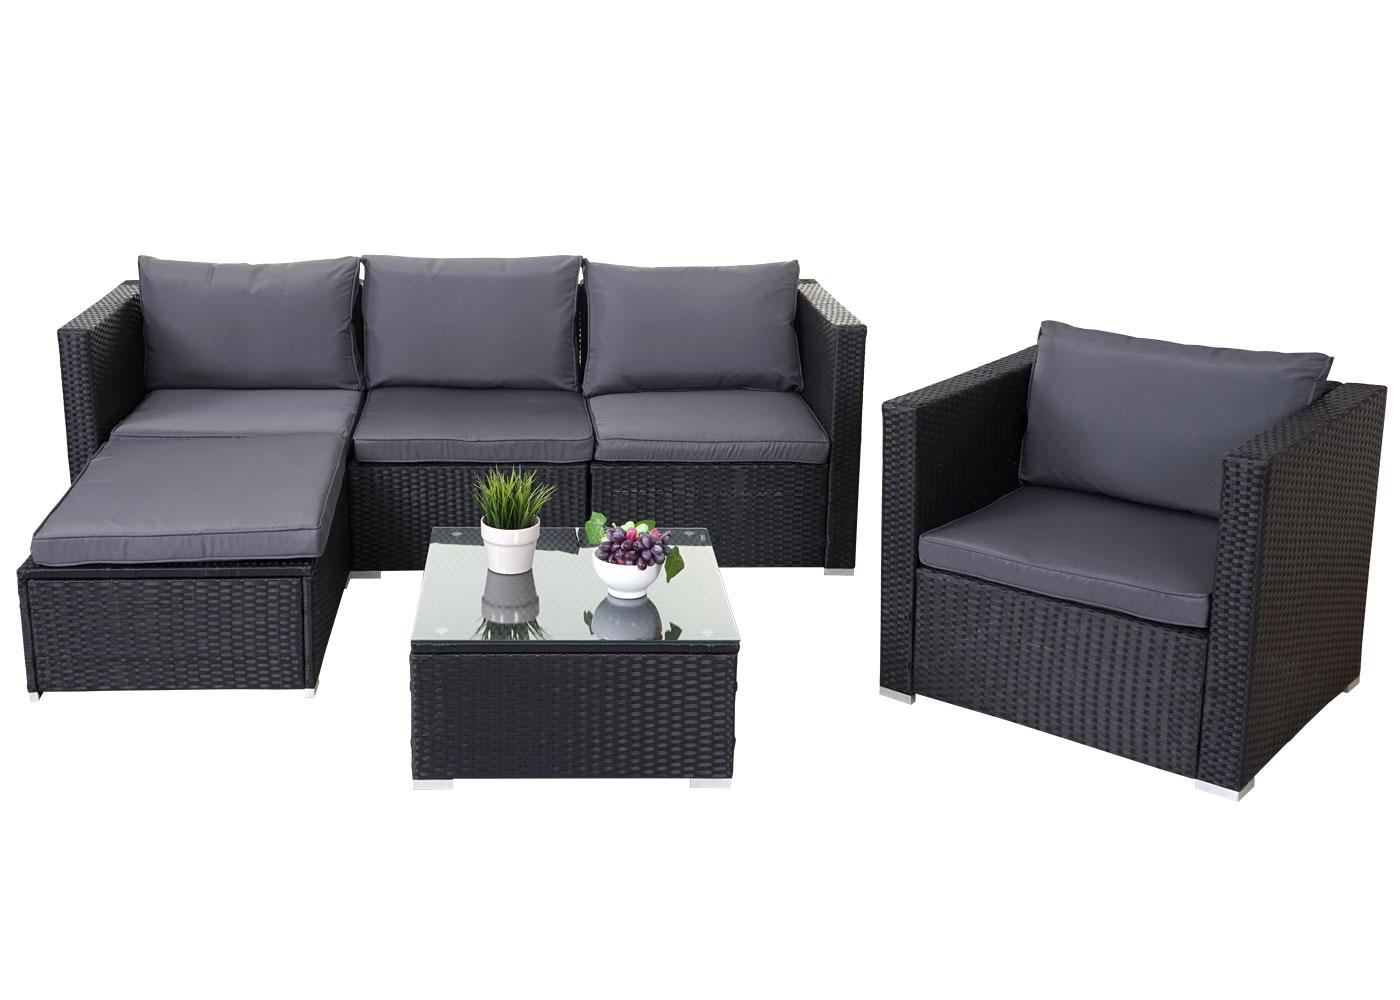 poly rattan garnitur brescia gartengarnitur sitzgruppe lounge set grau schwarz ebay. Black Bedroom Furniture Sets. Home Design Ideas